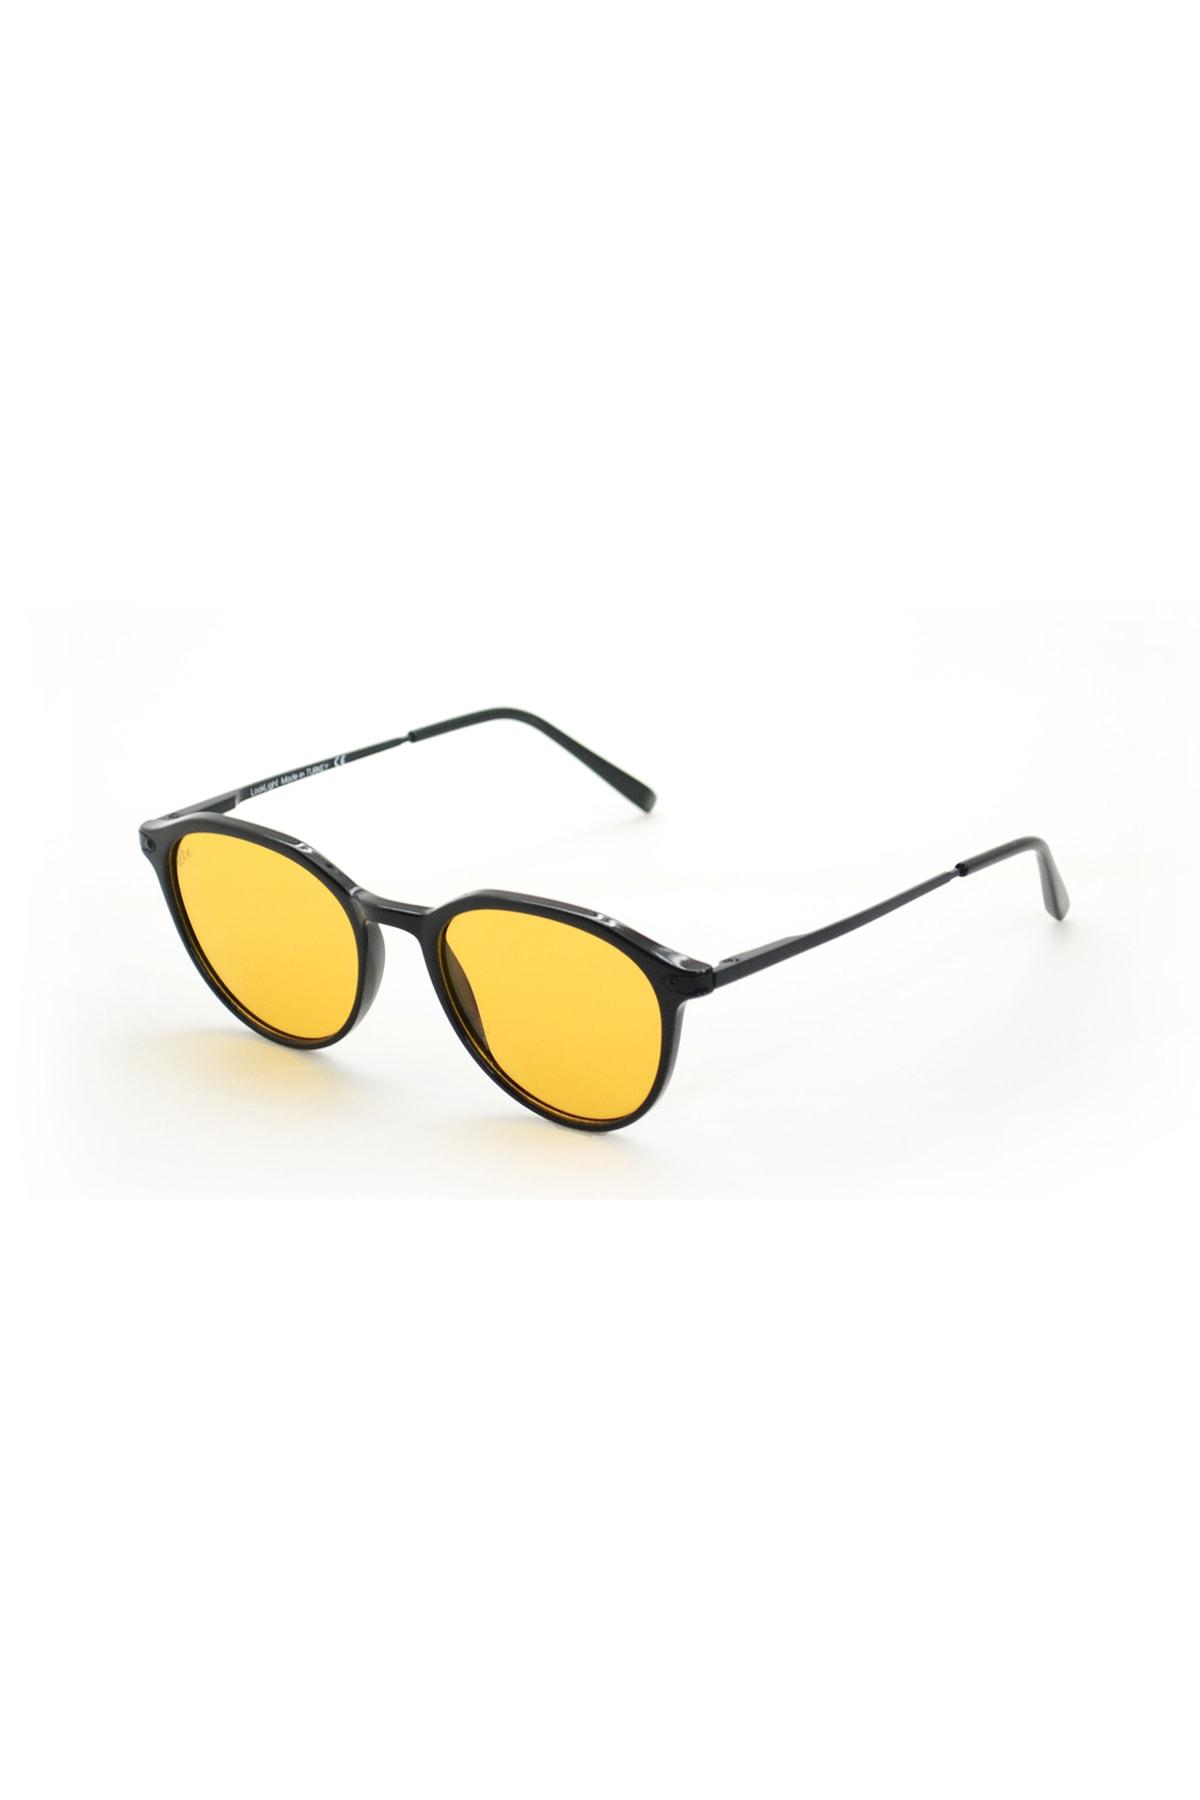 سفارش عینک آفتابی زنانه ارزان برند LOOKlight رنگ متالیک کد ty76158069